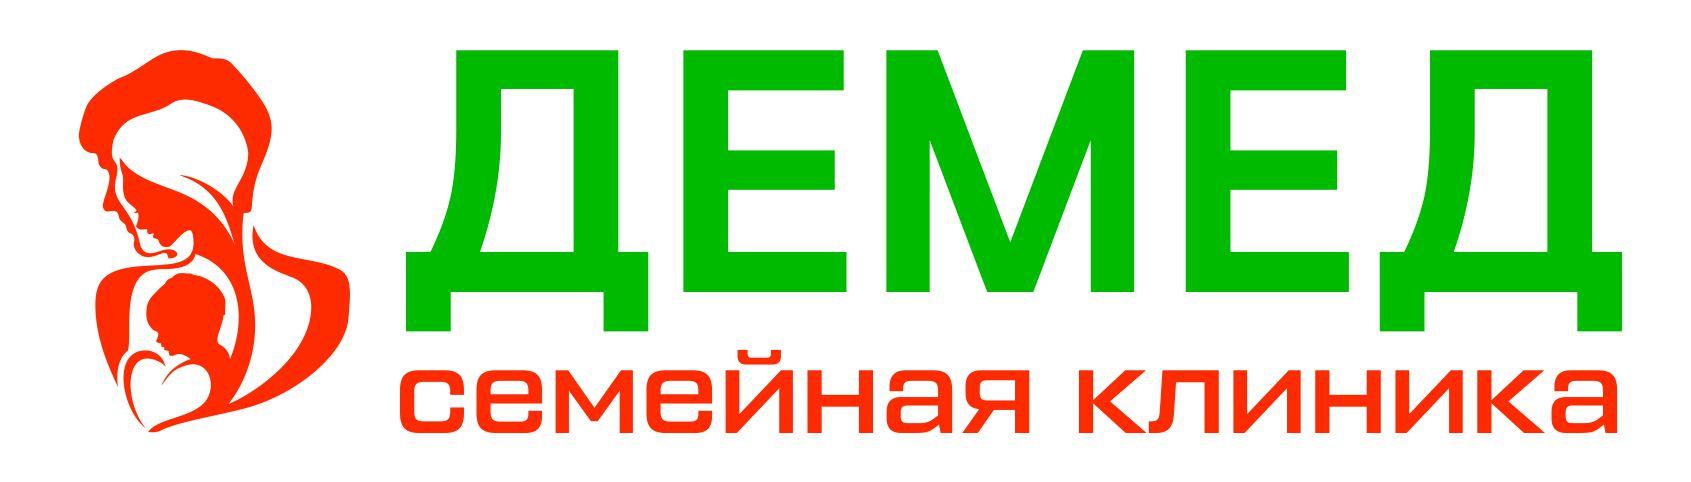 Логотип медицинского центра фото f_4105dc9cbdbc609e.jpg